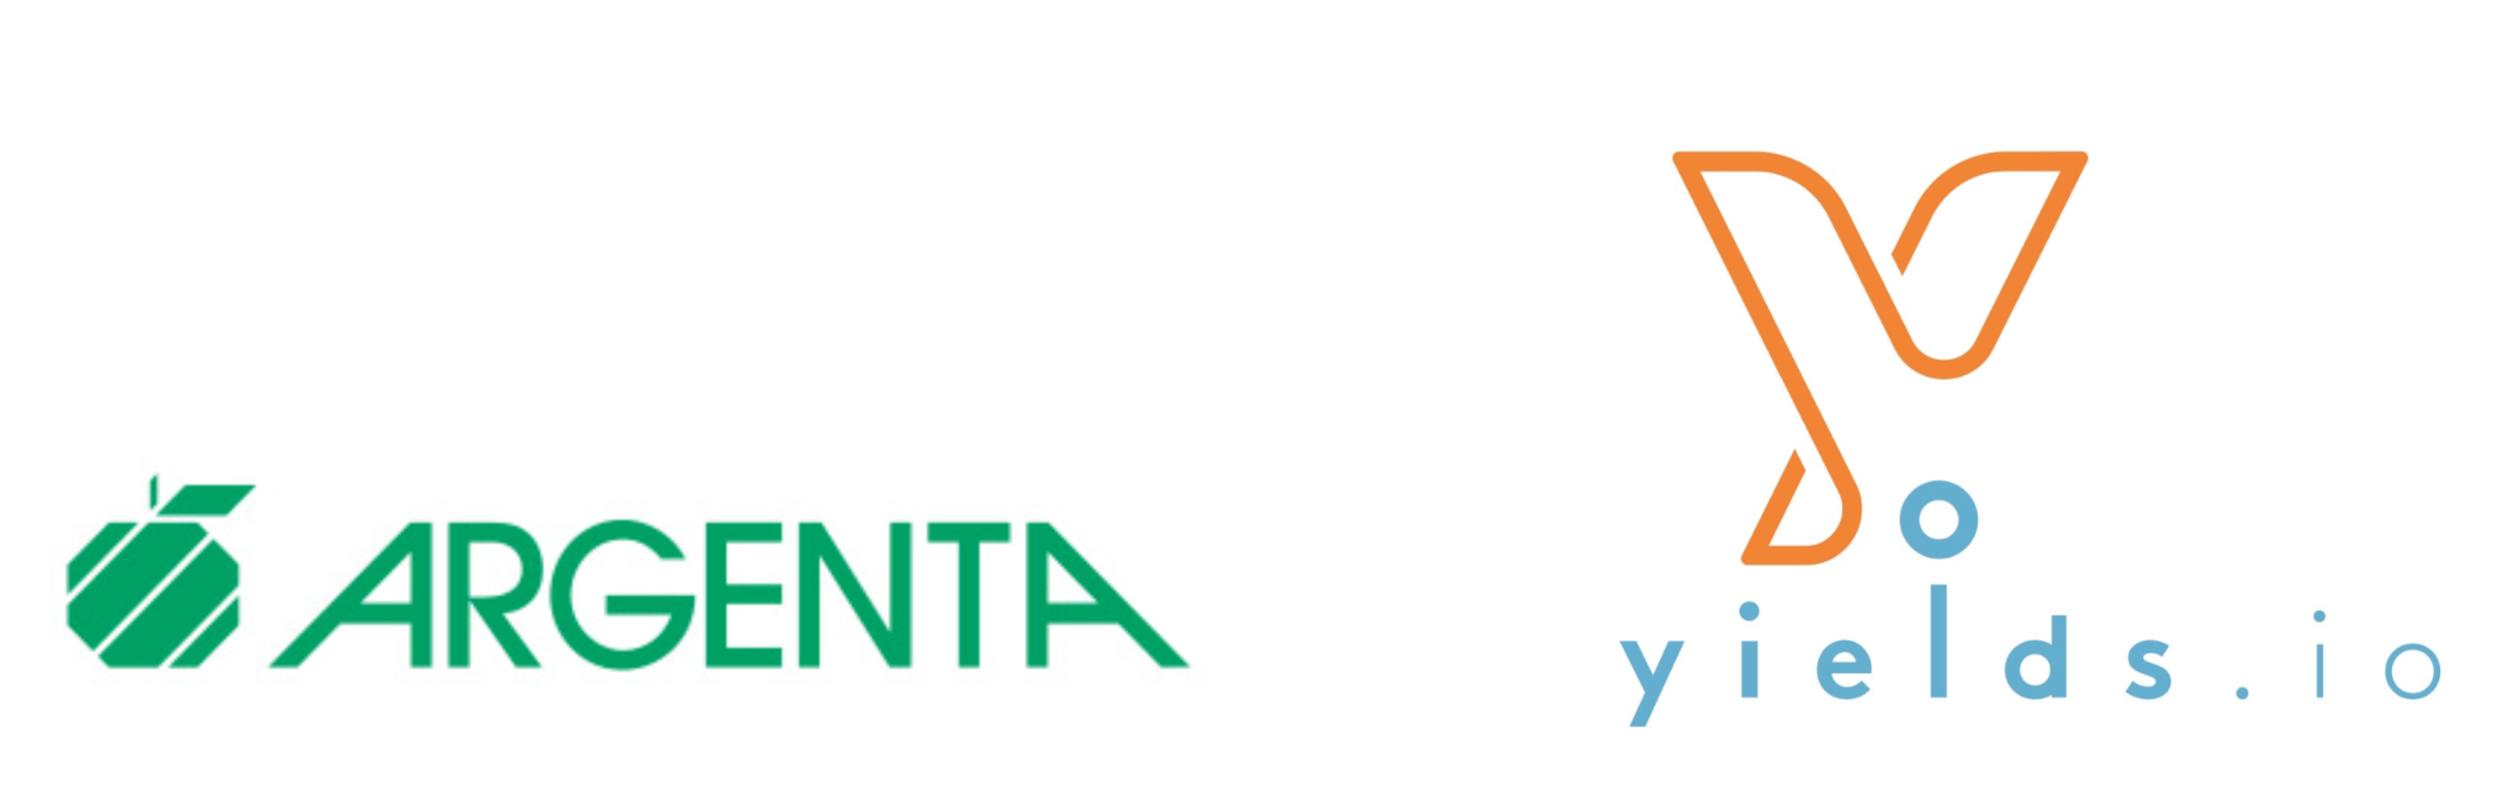 Yields-argenta-partnership.png